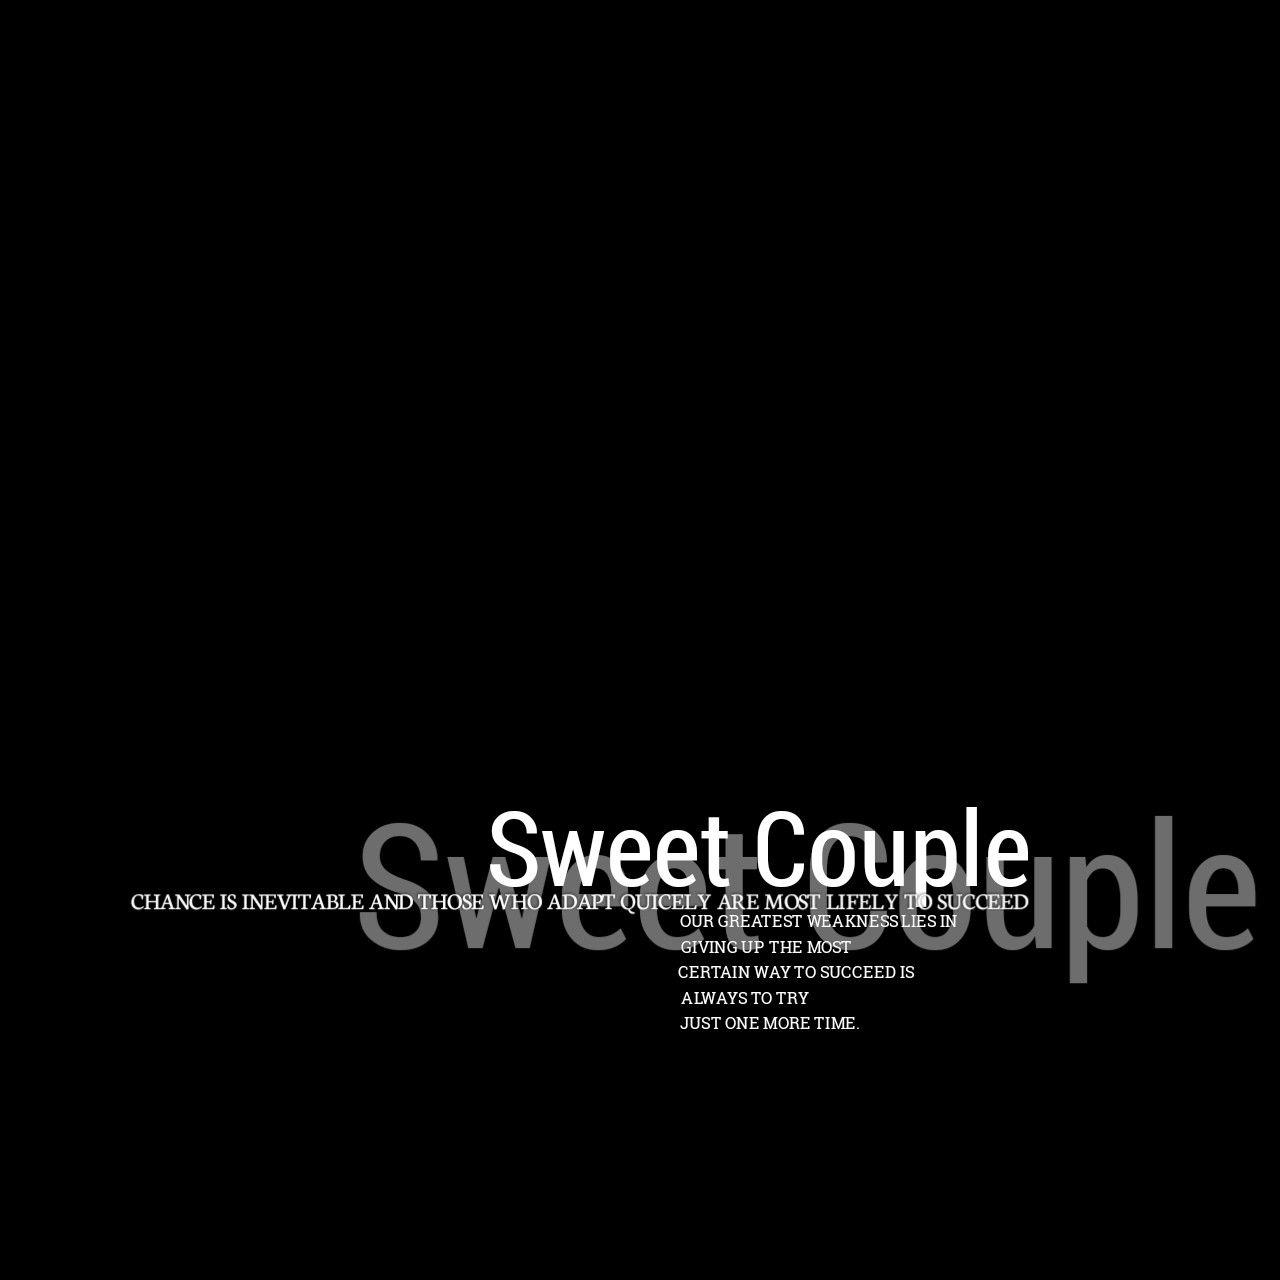 Sweet Couple Kata Kata Indah Pengeditan Foto Desain Grafis